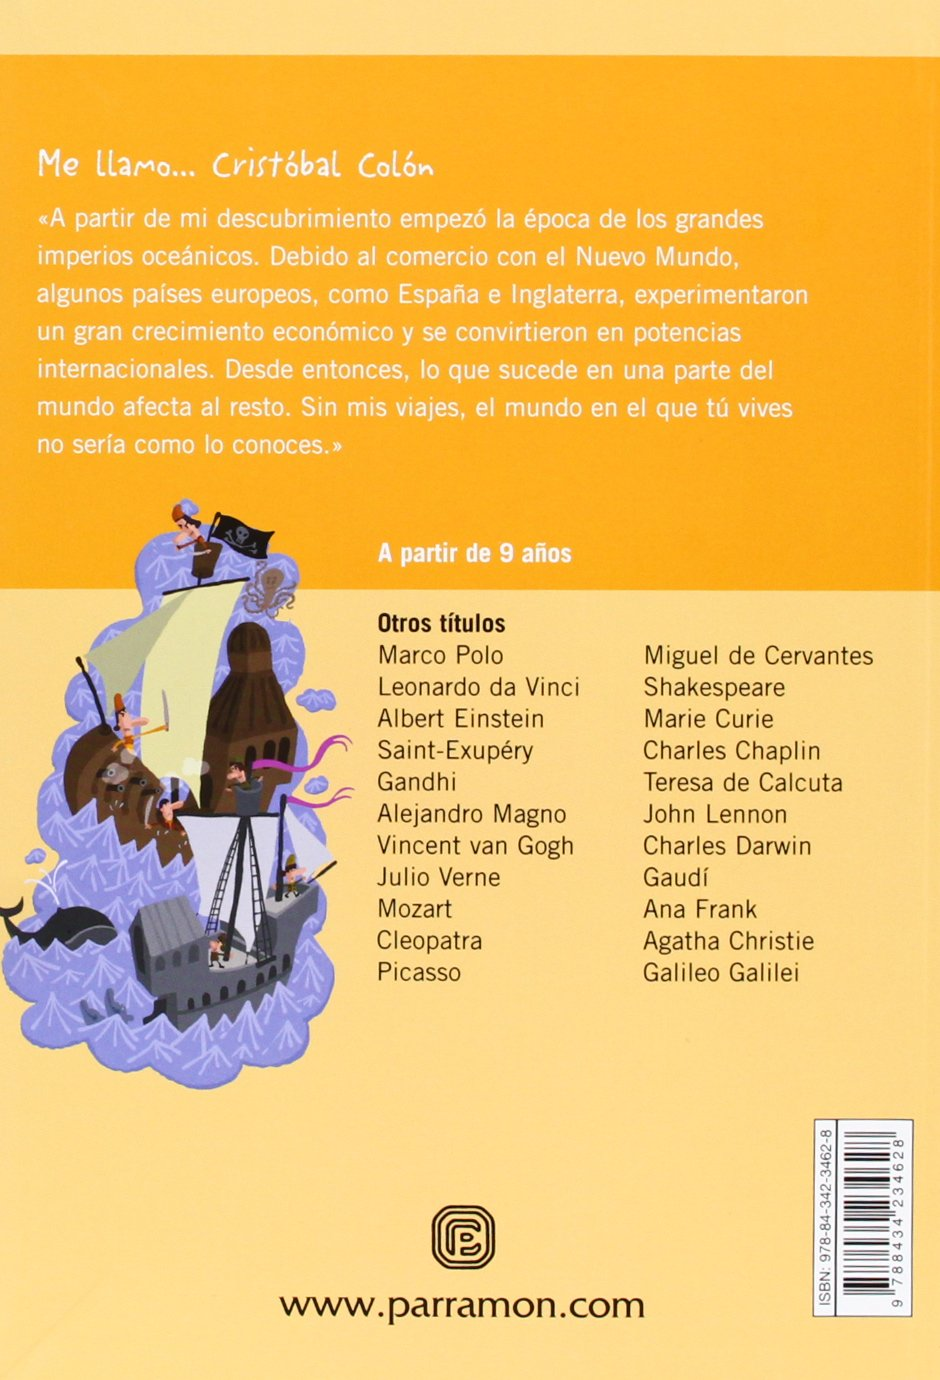 ME LLAMO CRISTOBAL COLON: Amazon.es: Garcés, Fernando, Julve ...